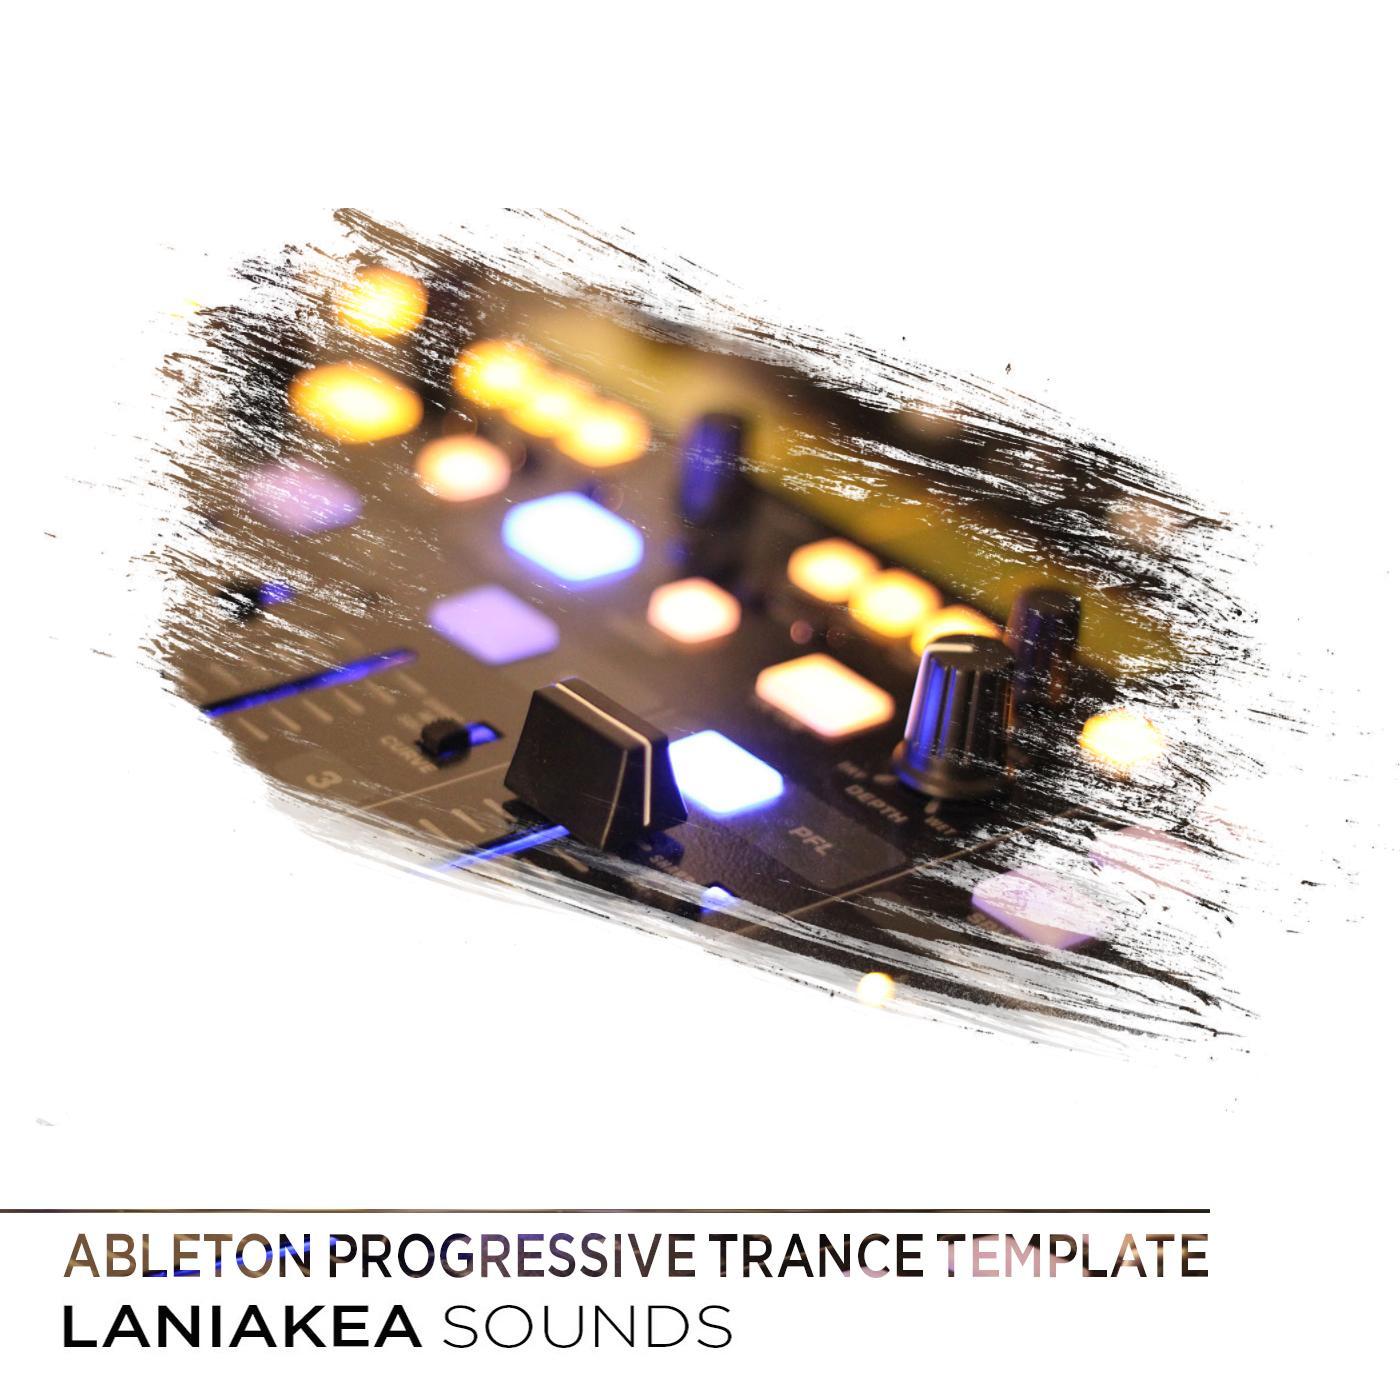 Ableton-Progressive-Trance-Template